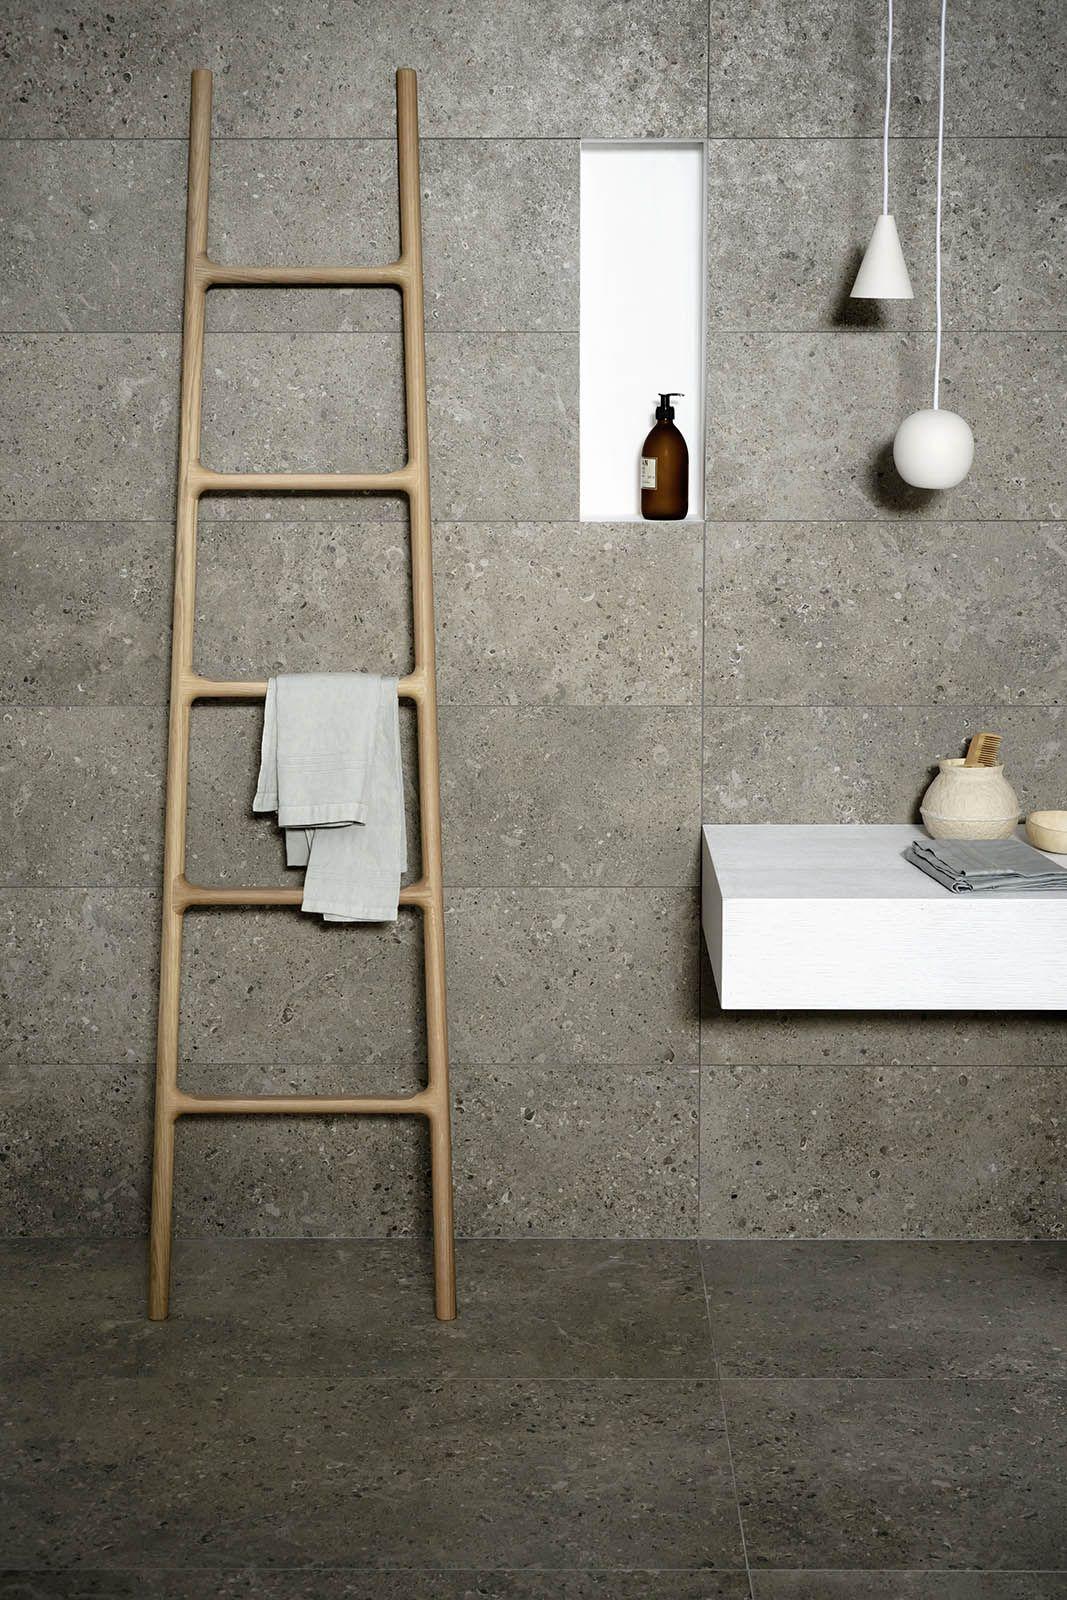 Boden- und Wandfliesen | Marazzi | Fliesen/ Tiles | Pinterest ... | {Fliesen steinoptik wandverkleidung badezimmer 43}